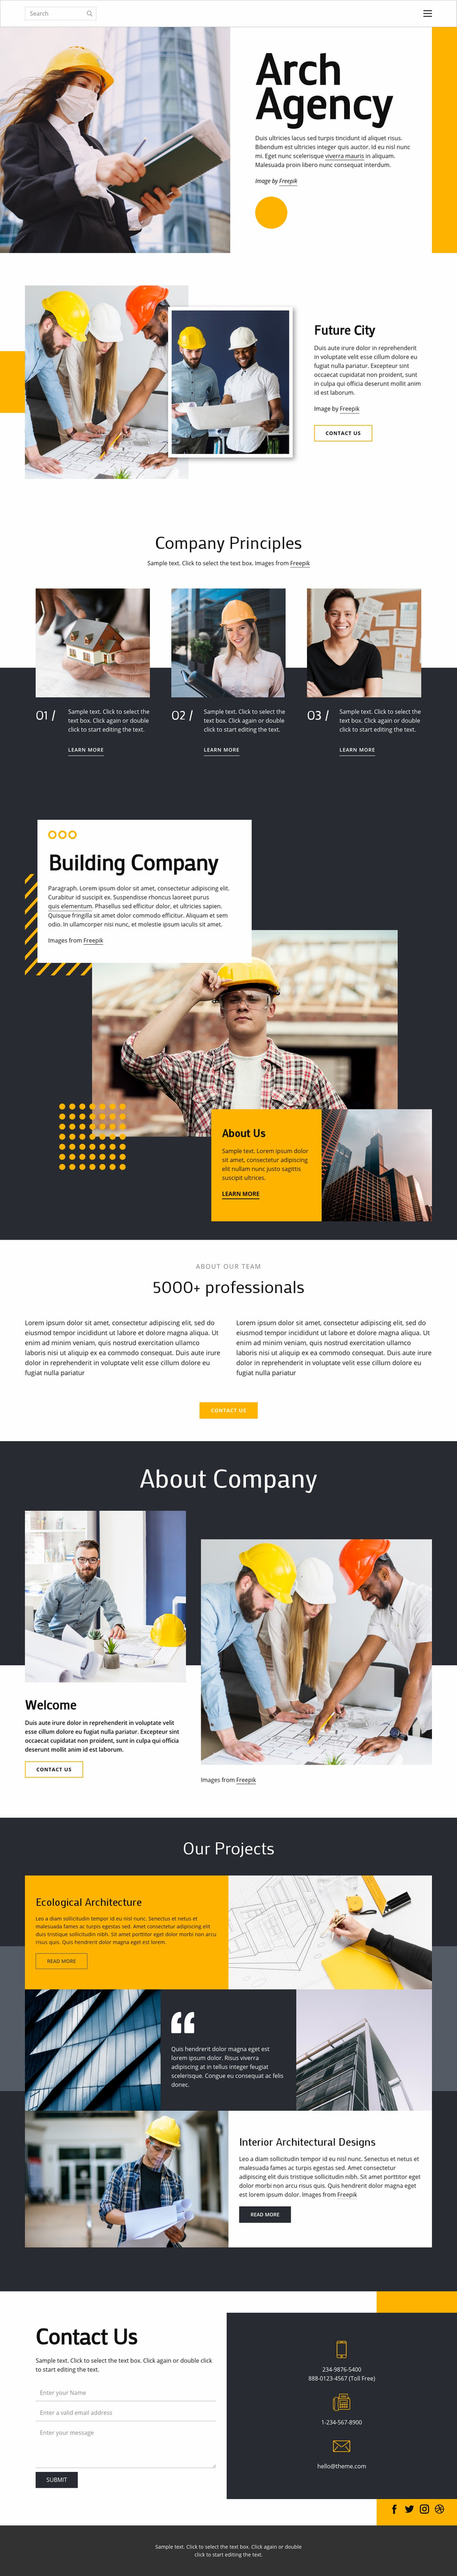 Award winning architects Web Page Designer